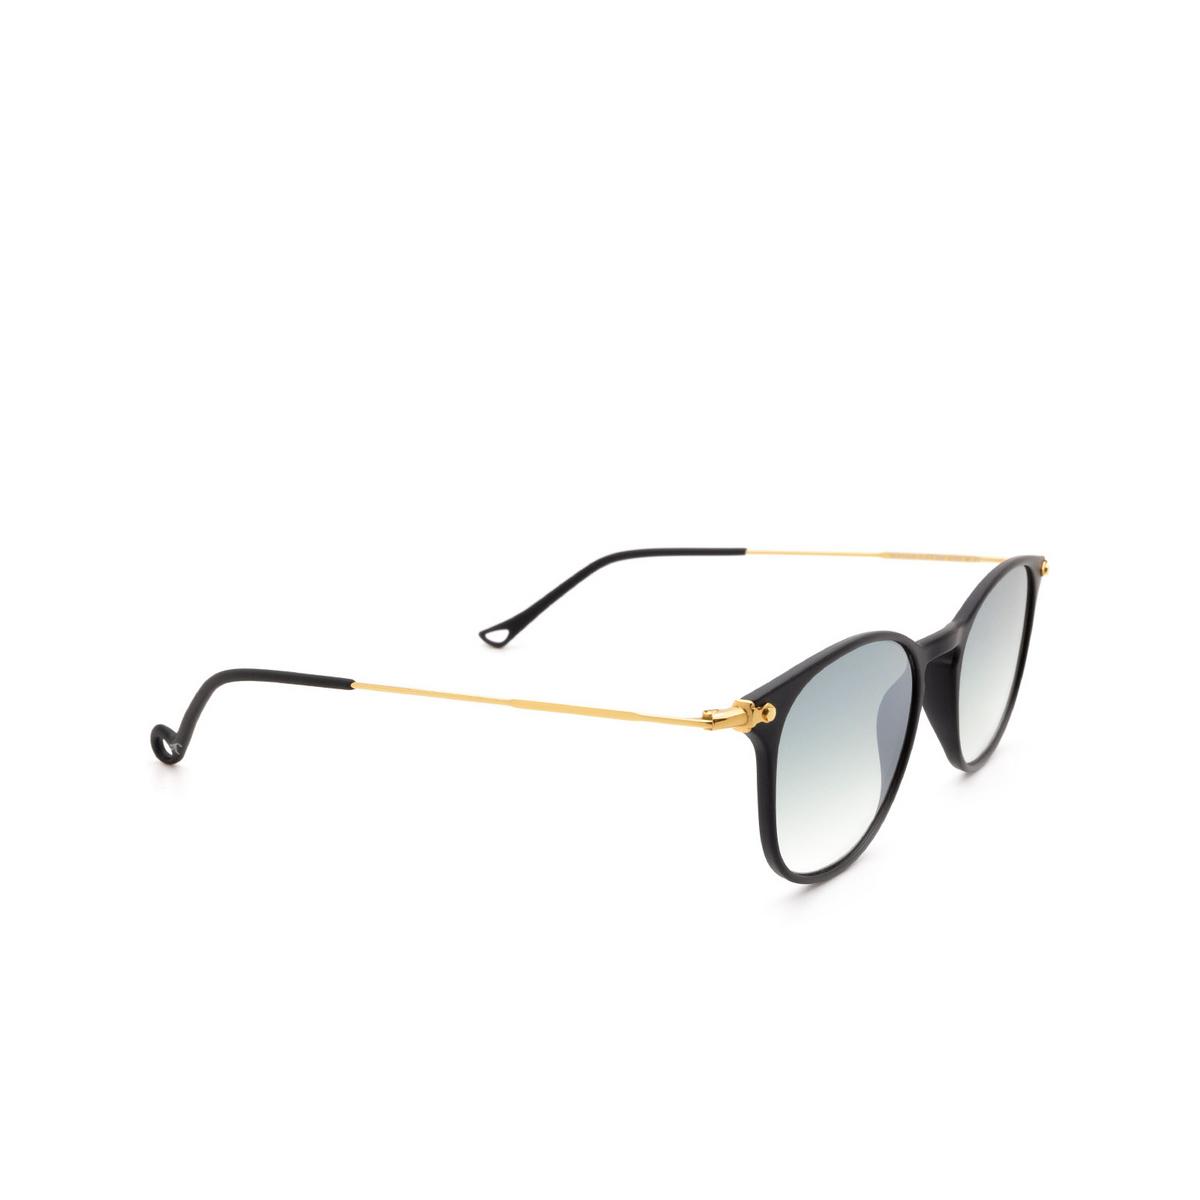 Eyepetizer® Square Sunglasses: Montauk color Black C.A-4-25F - three-quarters view.